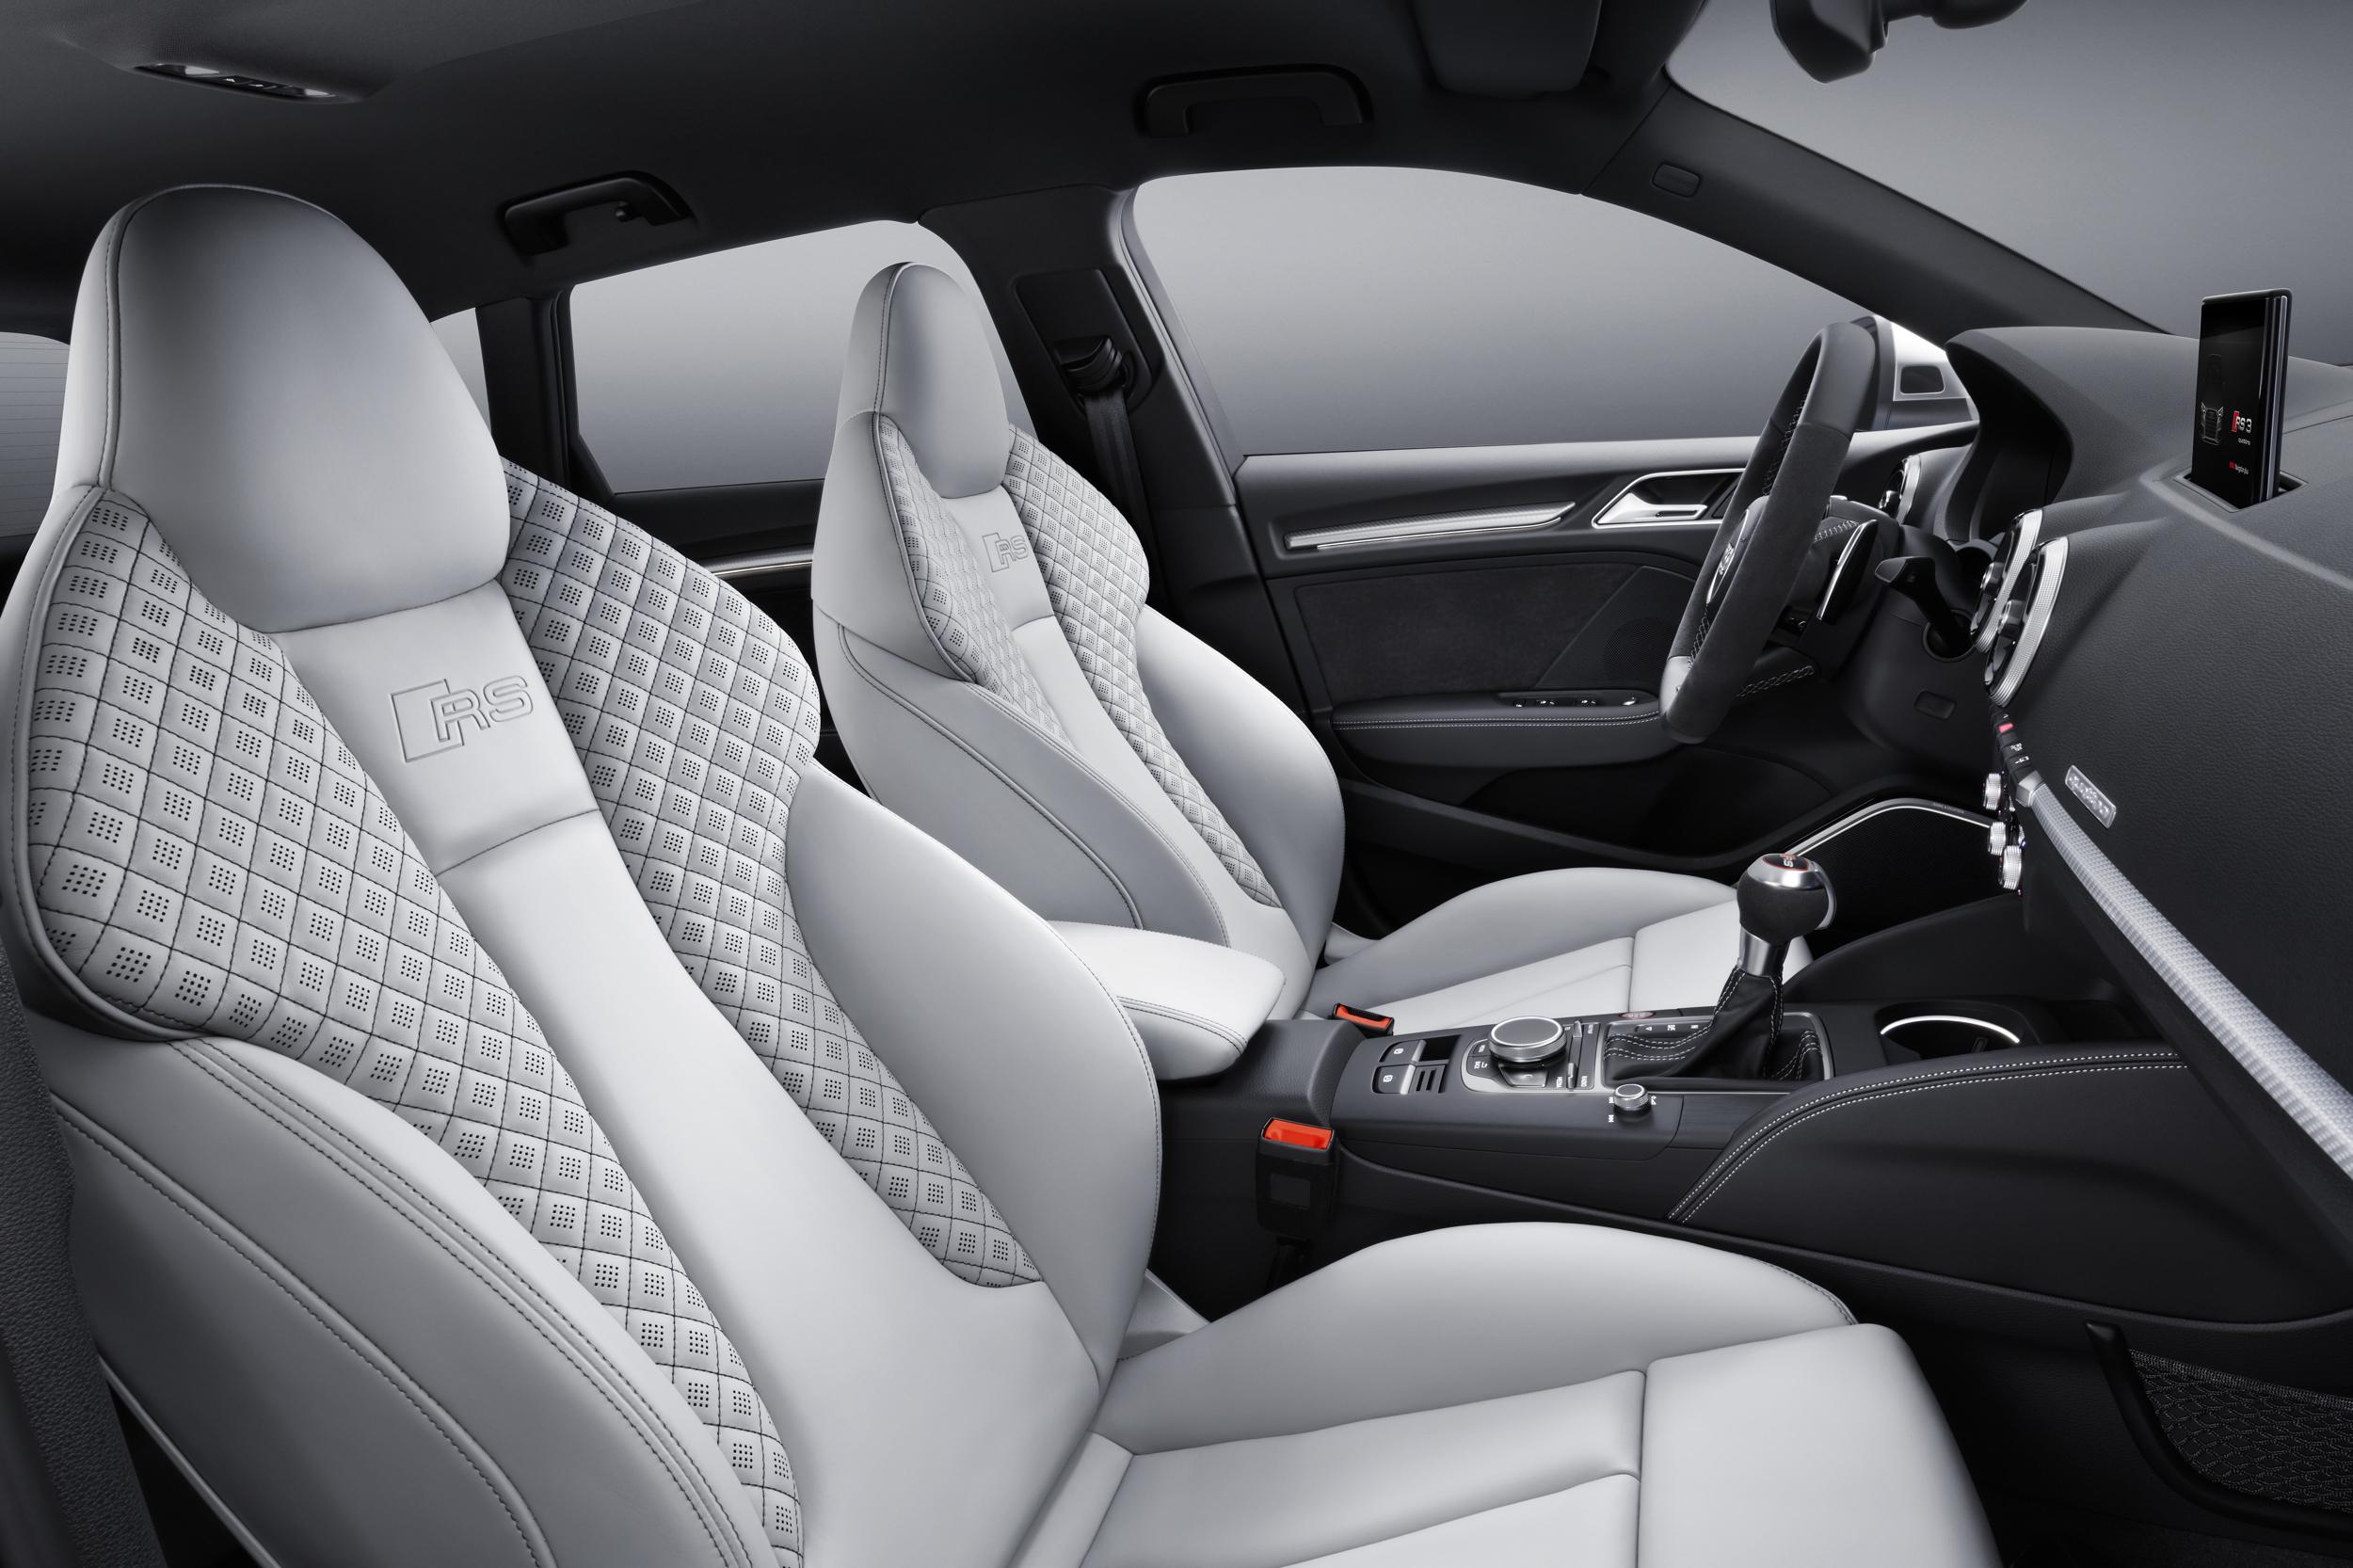 2017 Audi RS3 Sportback seats